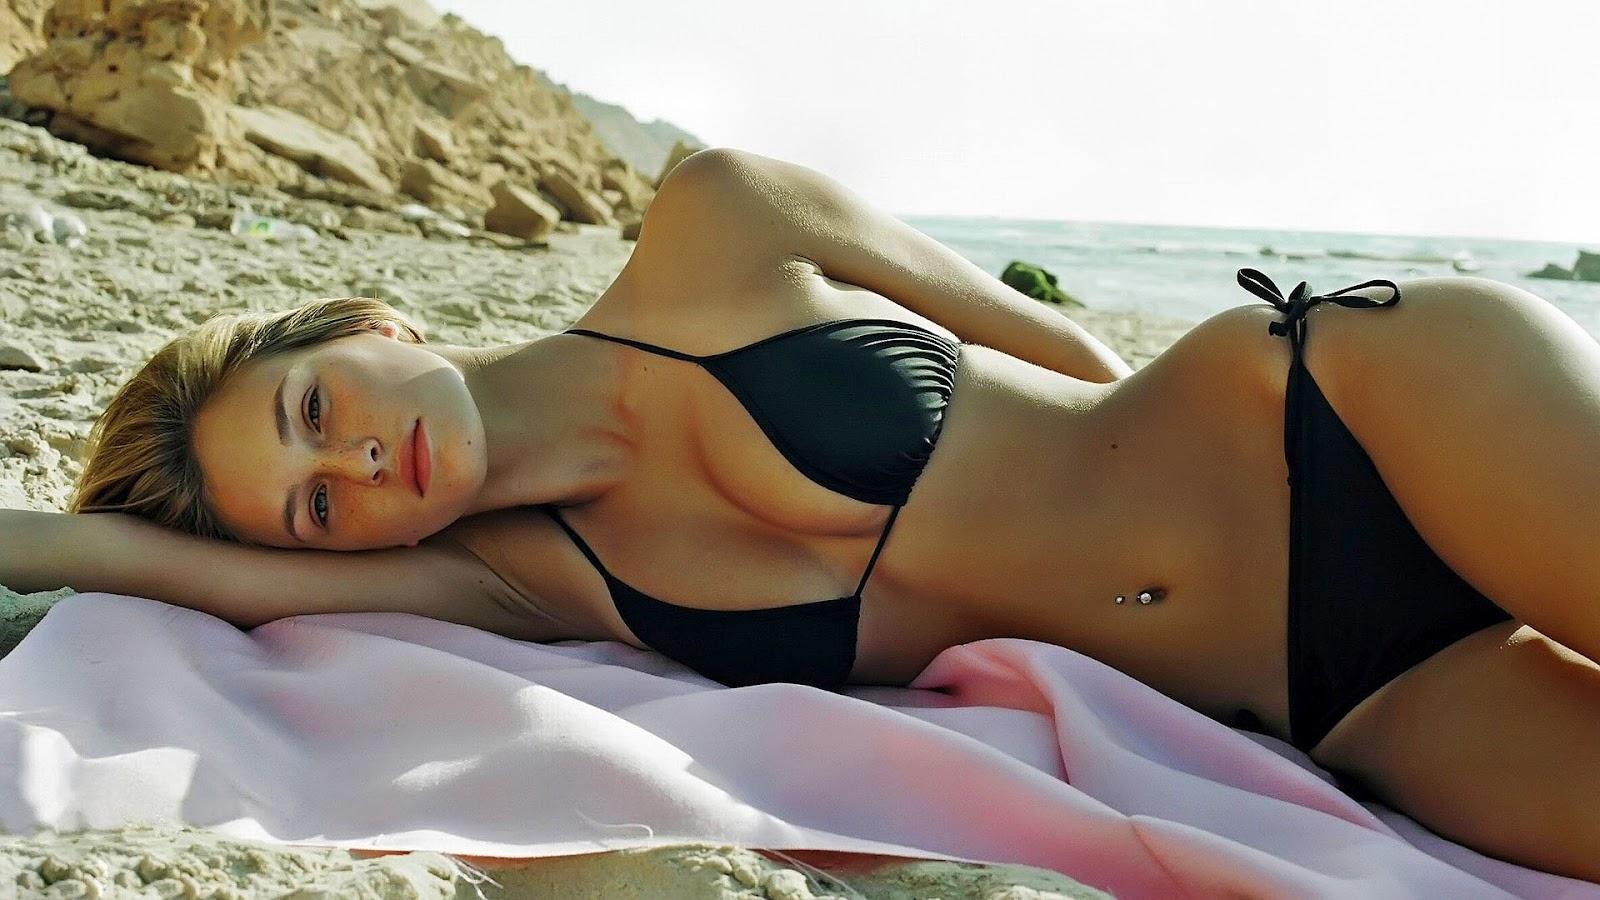 http://4.bp.blogspot.com/-C2v8w0EfI0E/UB40pYDNOsI/AAAAAAAAEZU/4yNAejG1BN4/s1600/hd-bikini-achtergrond-met-een-mooie-meid-die-ligt-te-zonnen-op-het-strand-zomer-wallpaper.jpg